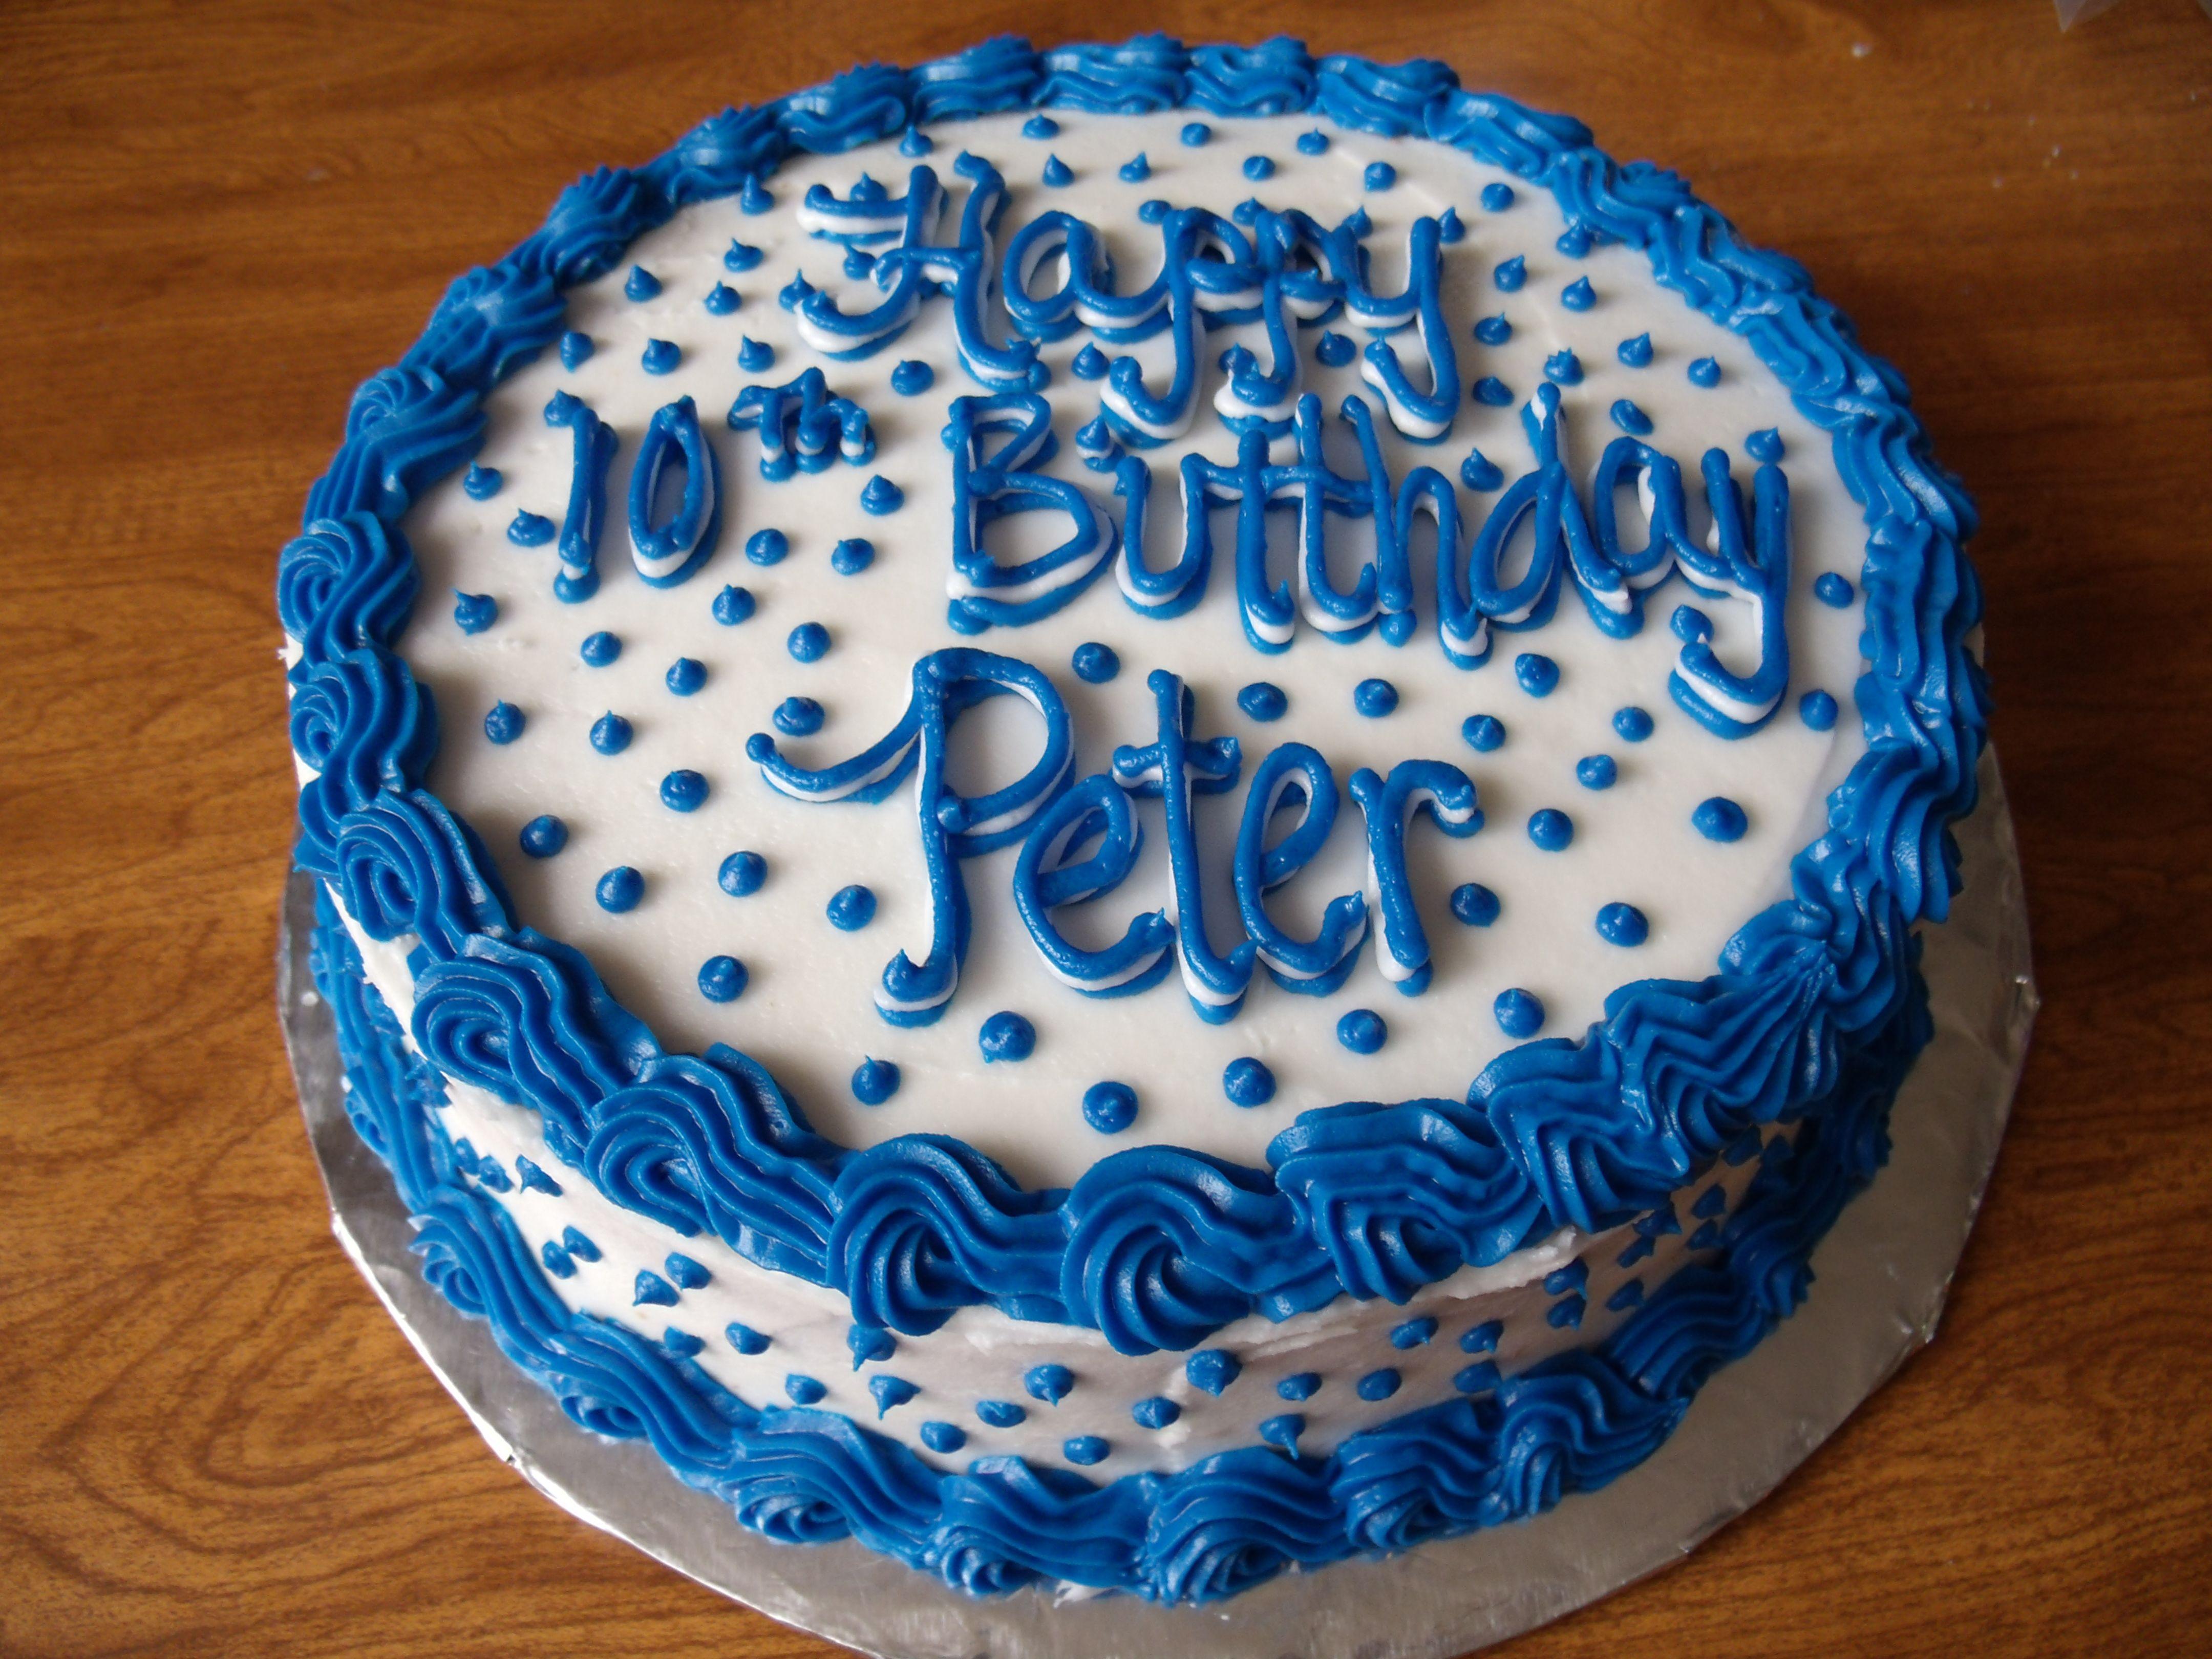 Birthday cake for boy TheCakeLady by Michele